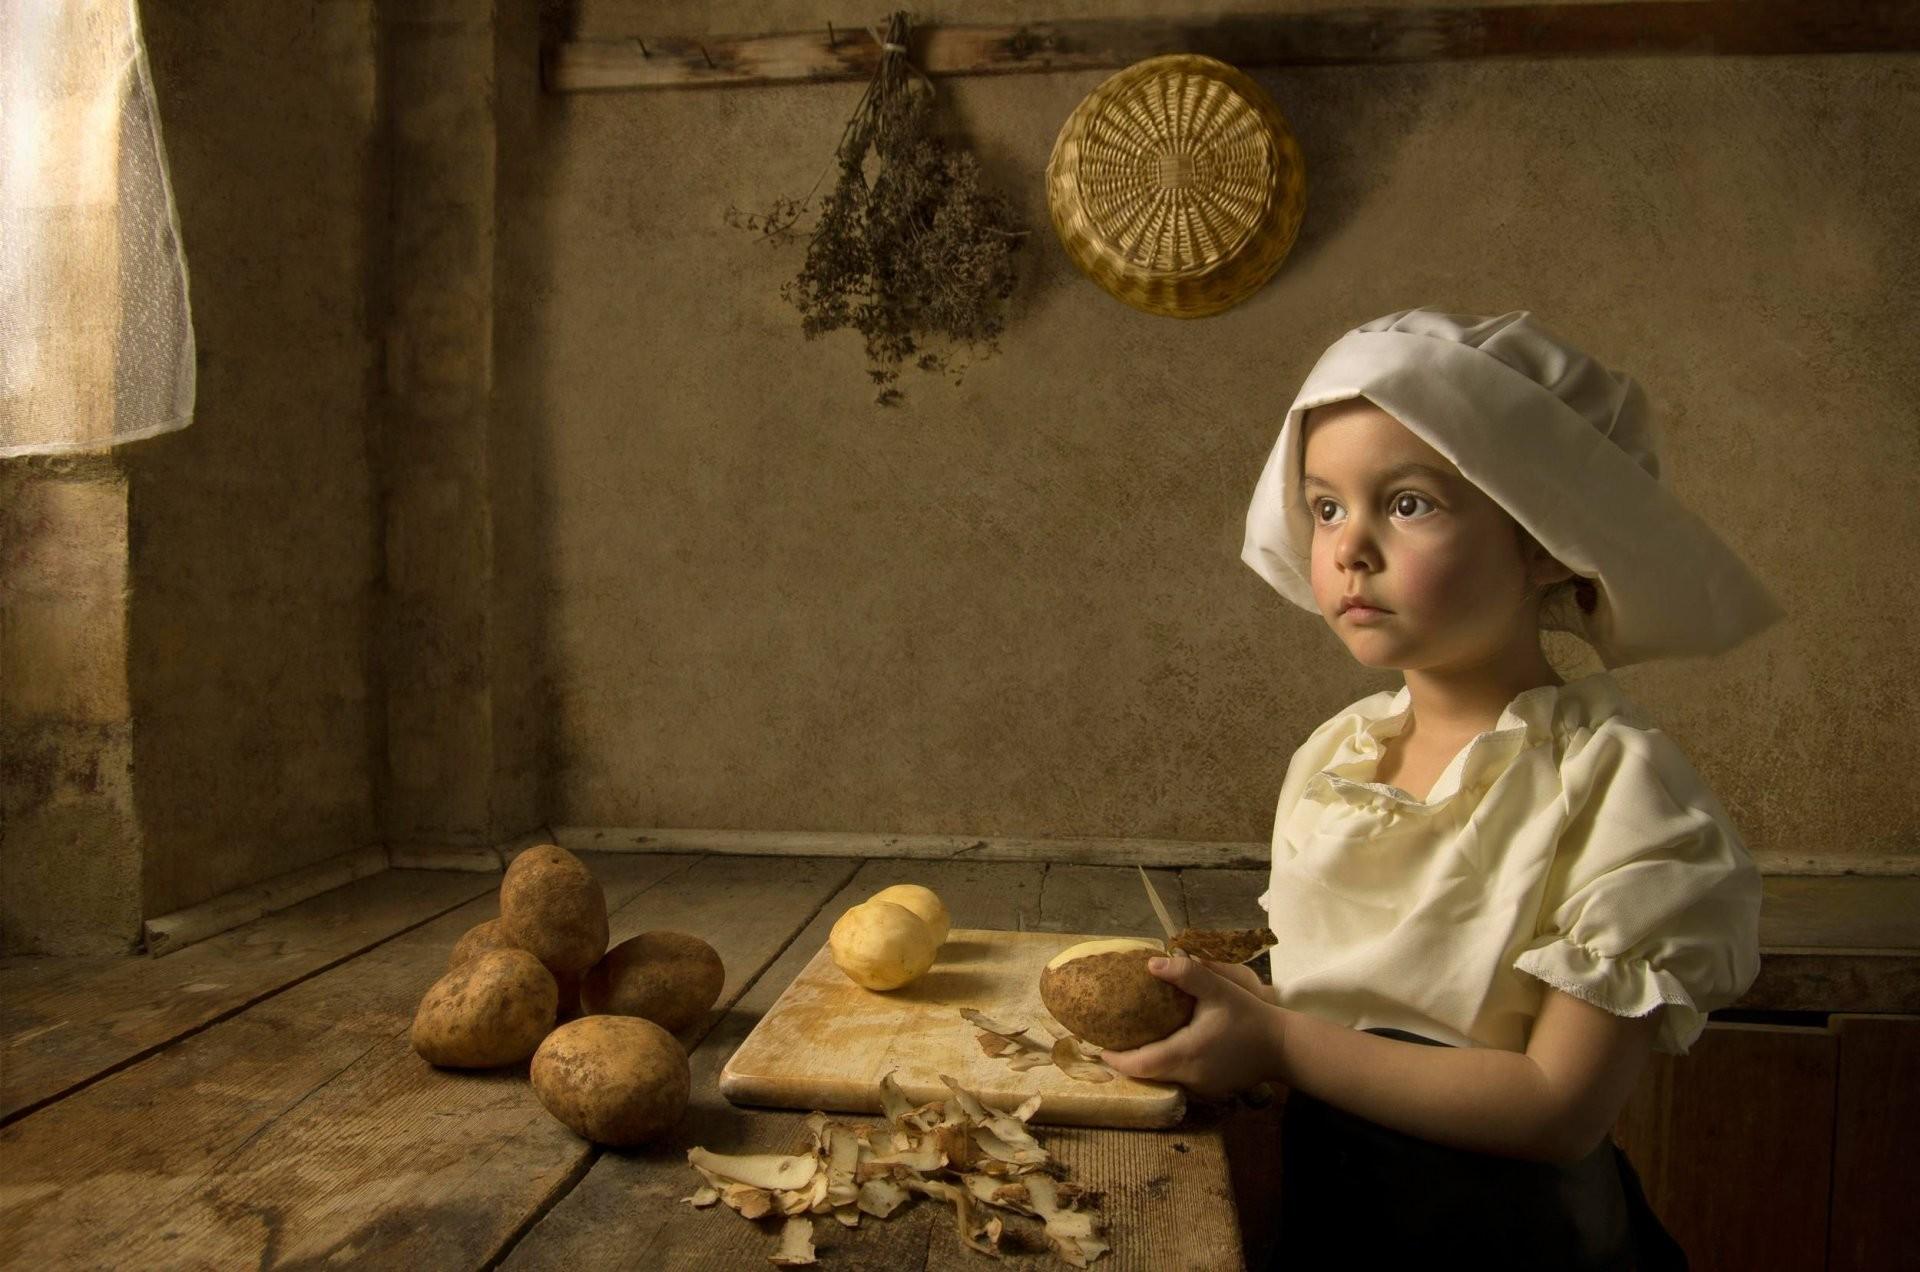 girl cook art style imitation styling renaissance ♛